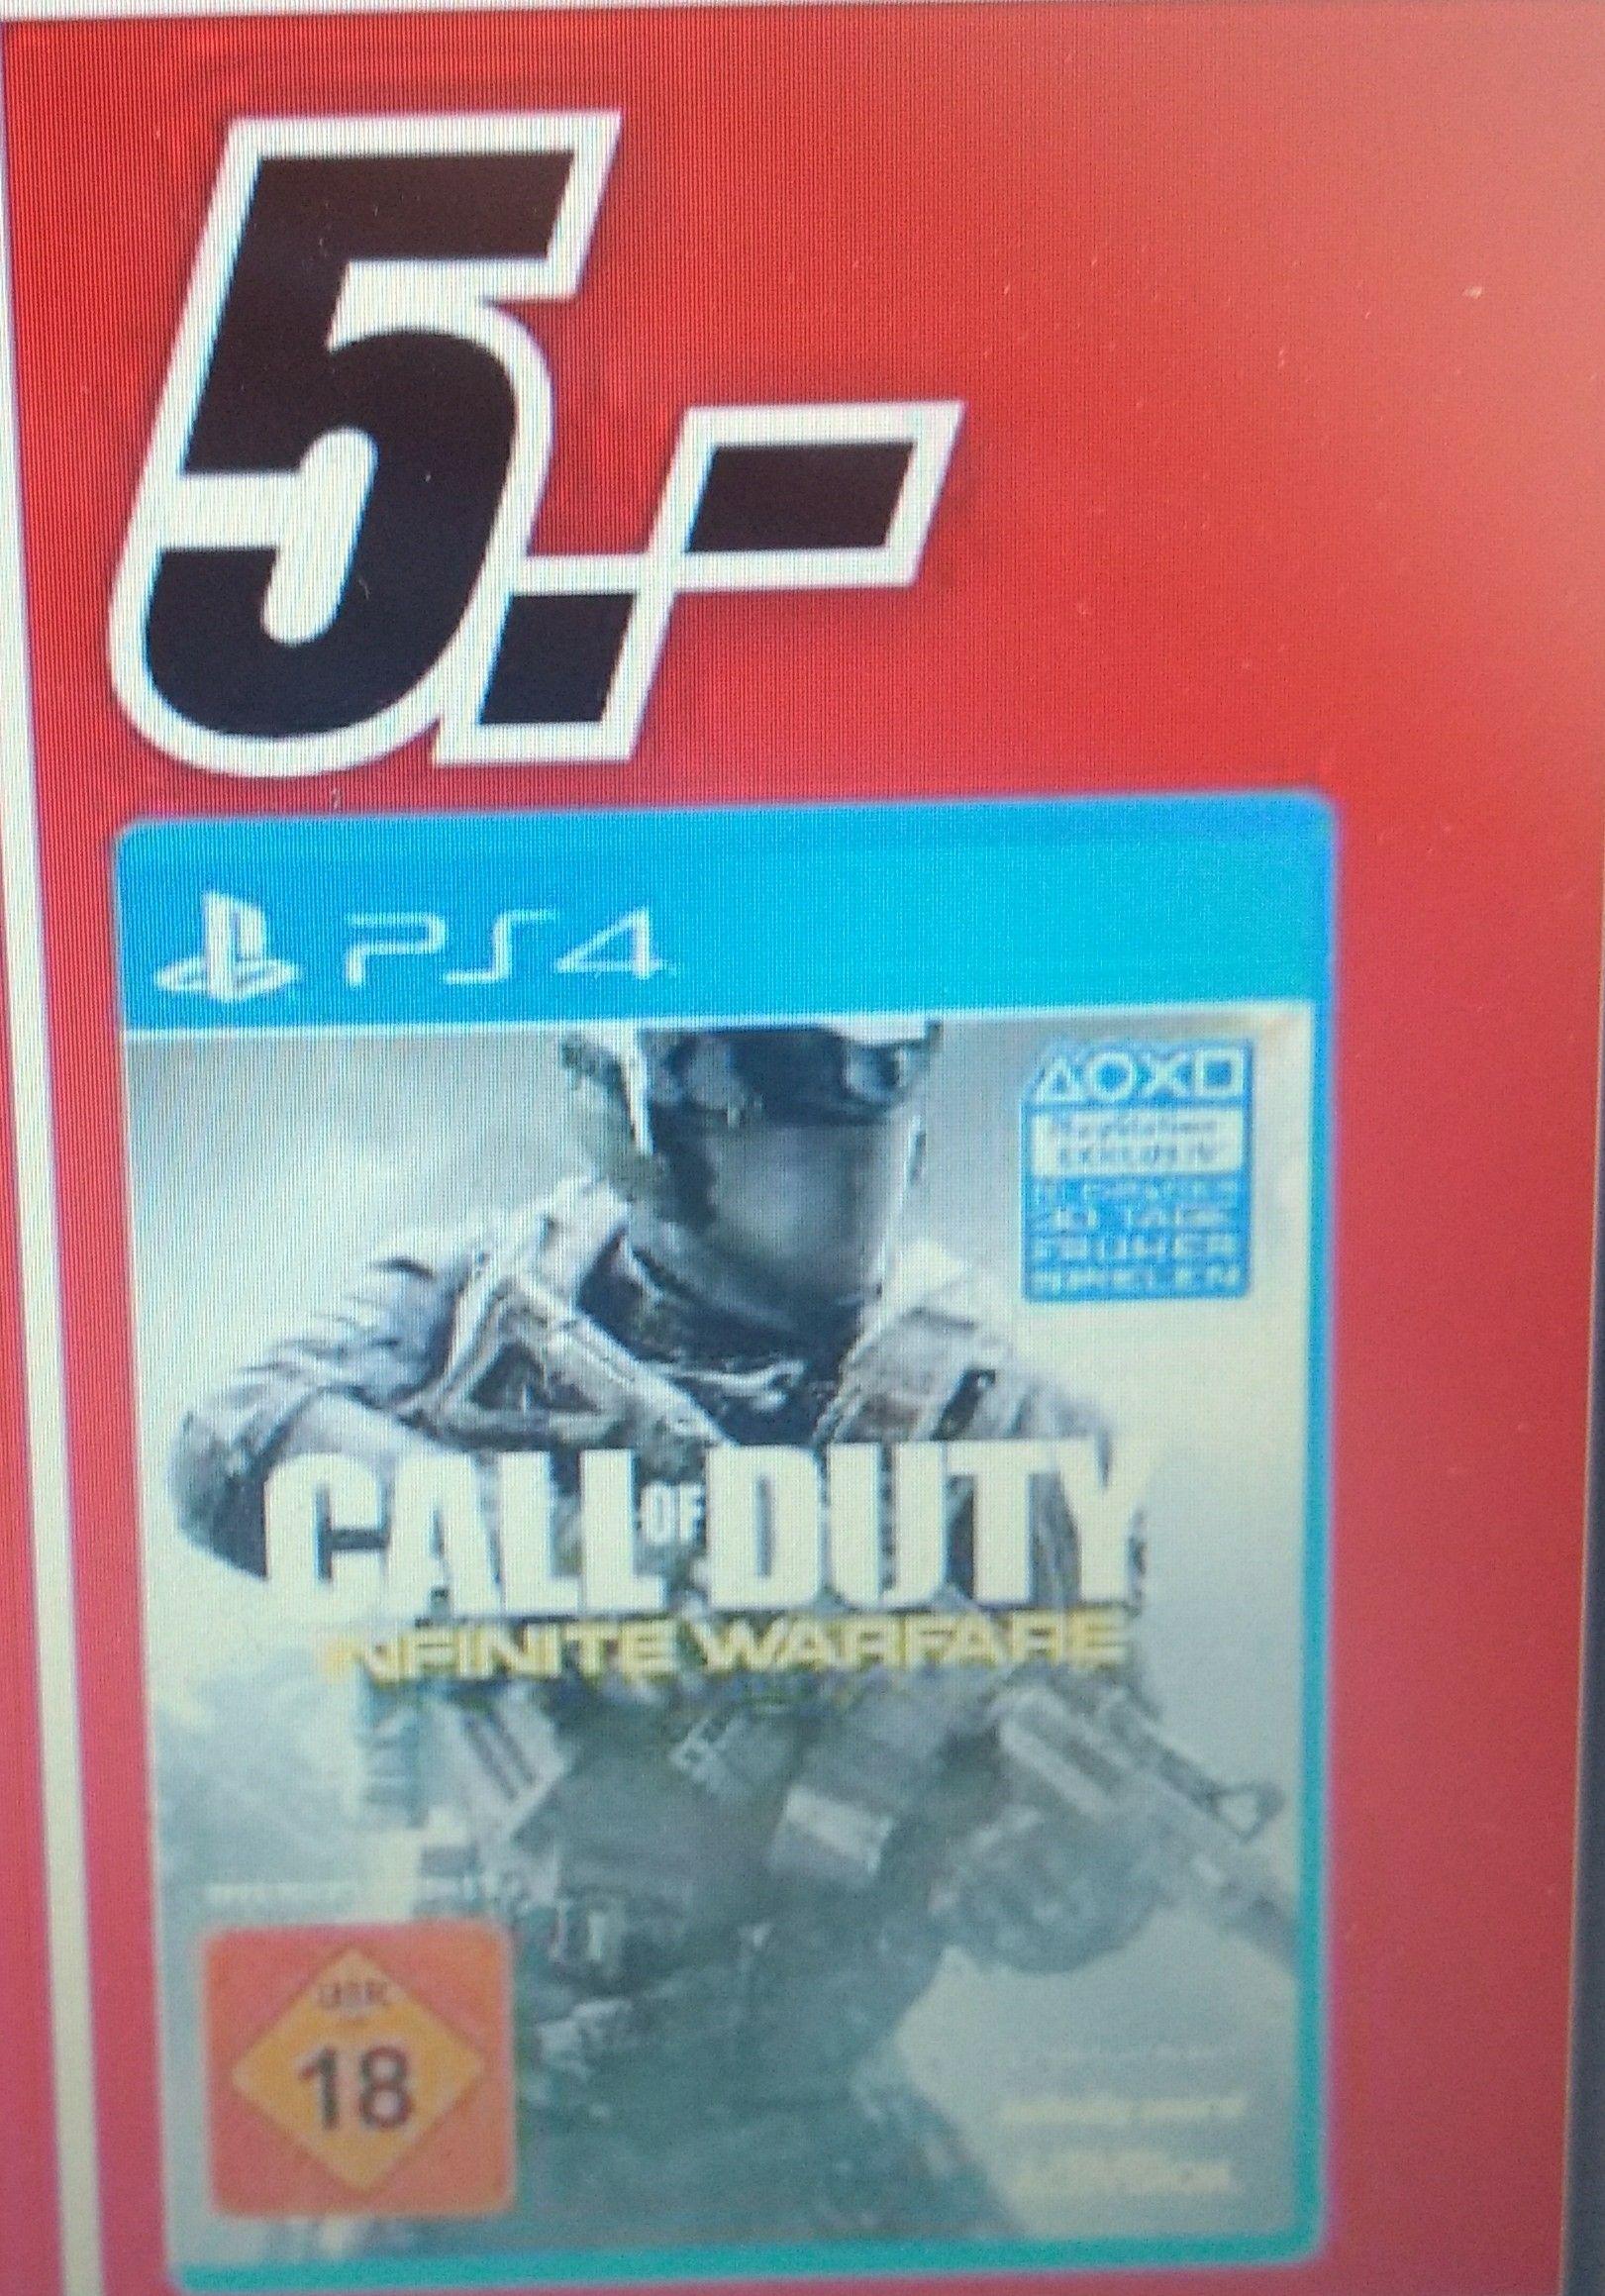 Call of Duty: Infinite Warfare(PS4) (Lokal Mediamarkt Weiden)